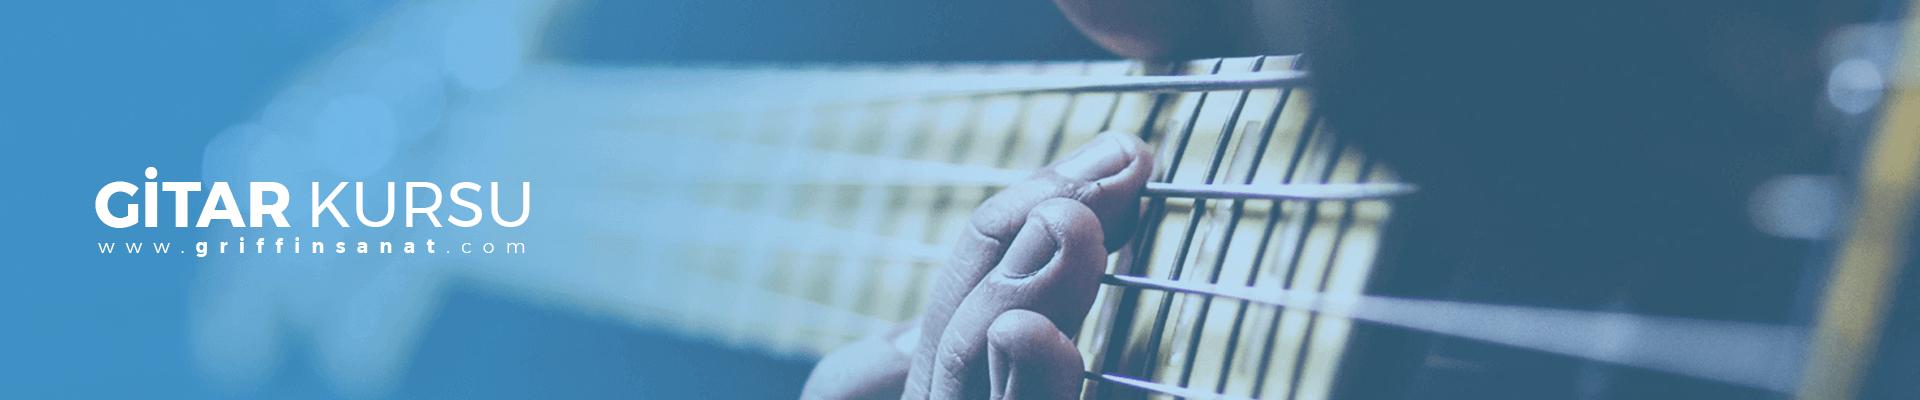 izmir-gitar-kursu